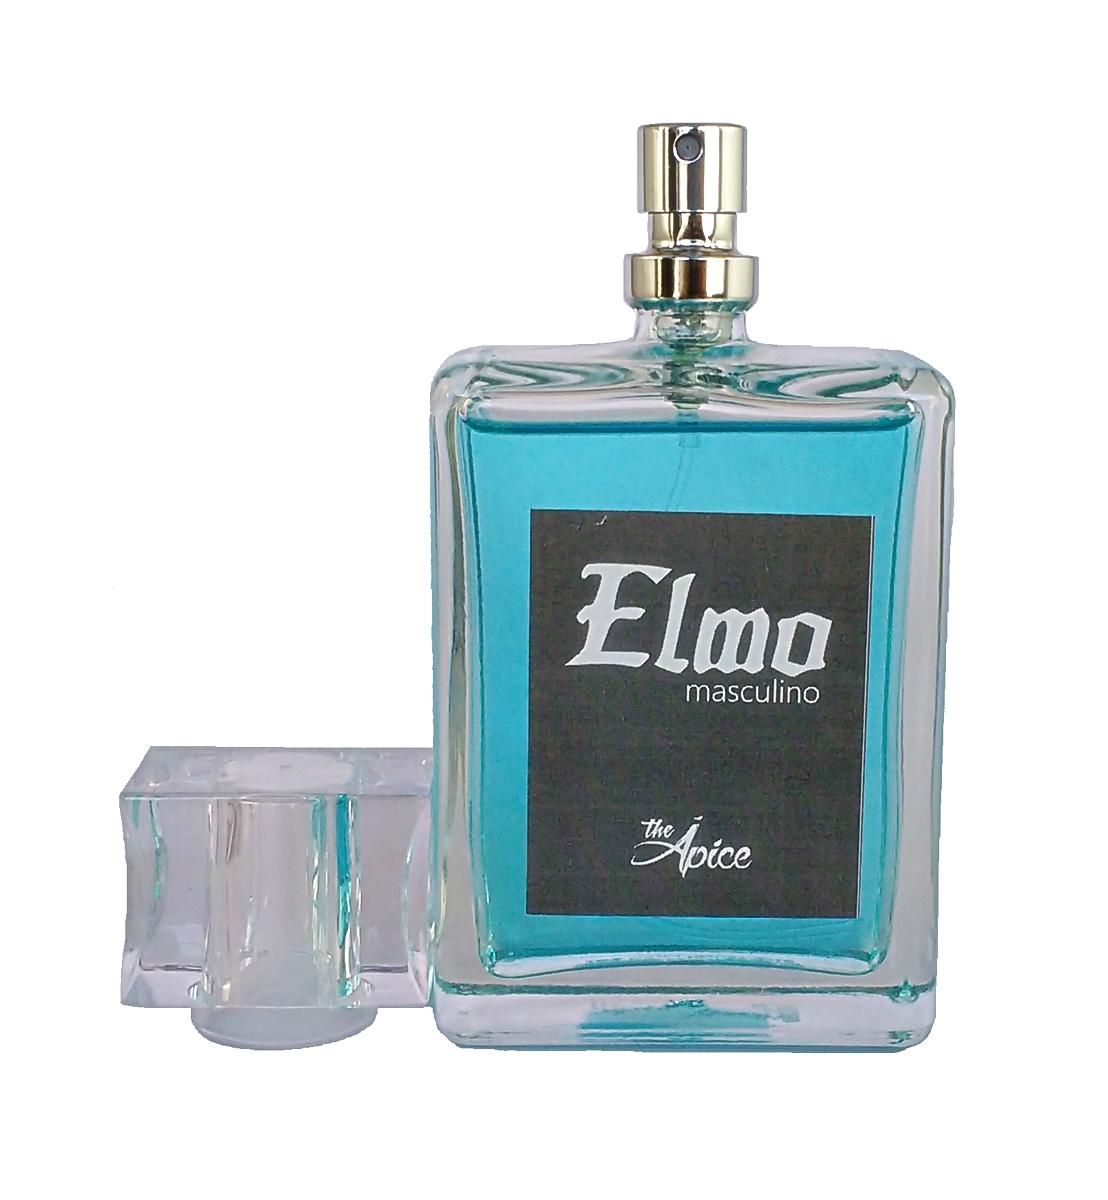 Perfume Inspirado Armani Mania Mas 100ml no Elo7   The Ápice (8B2AA1) b6fab2bcd6